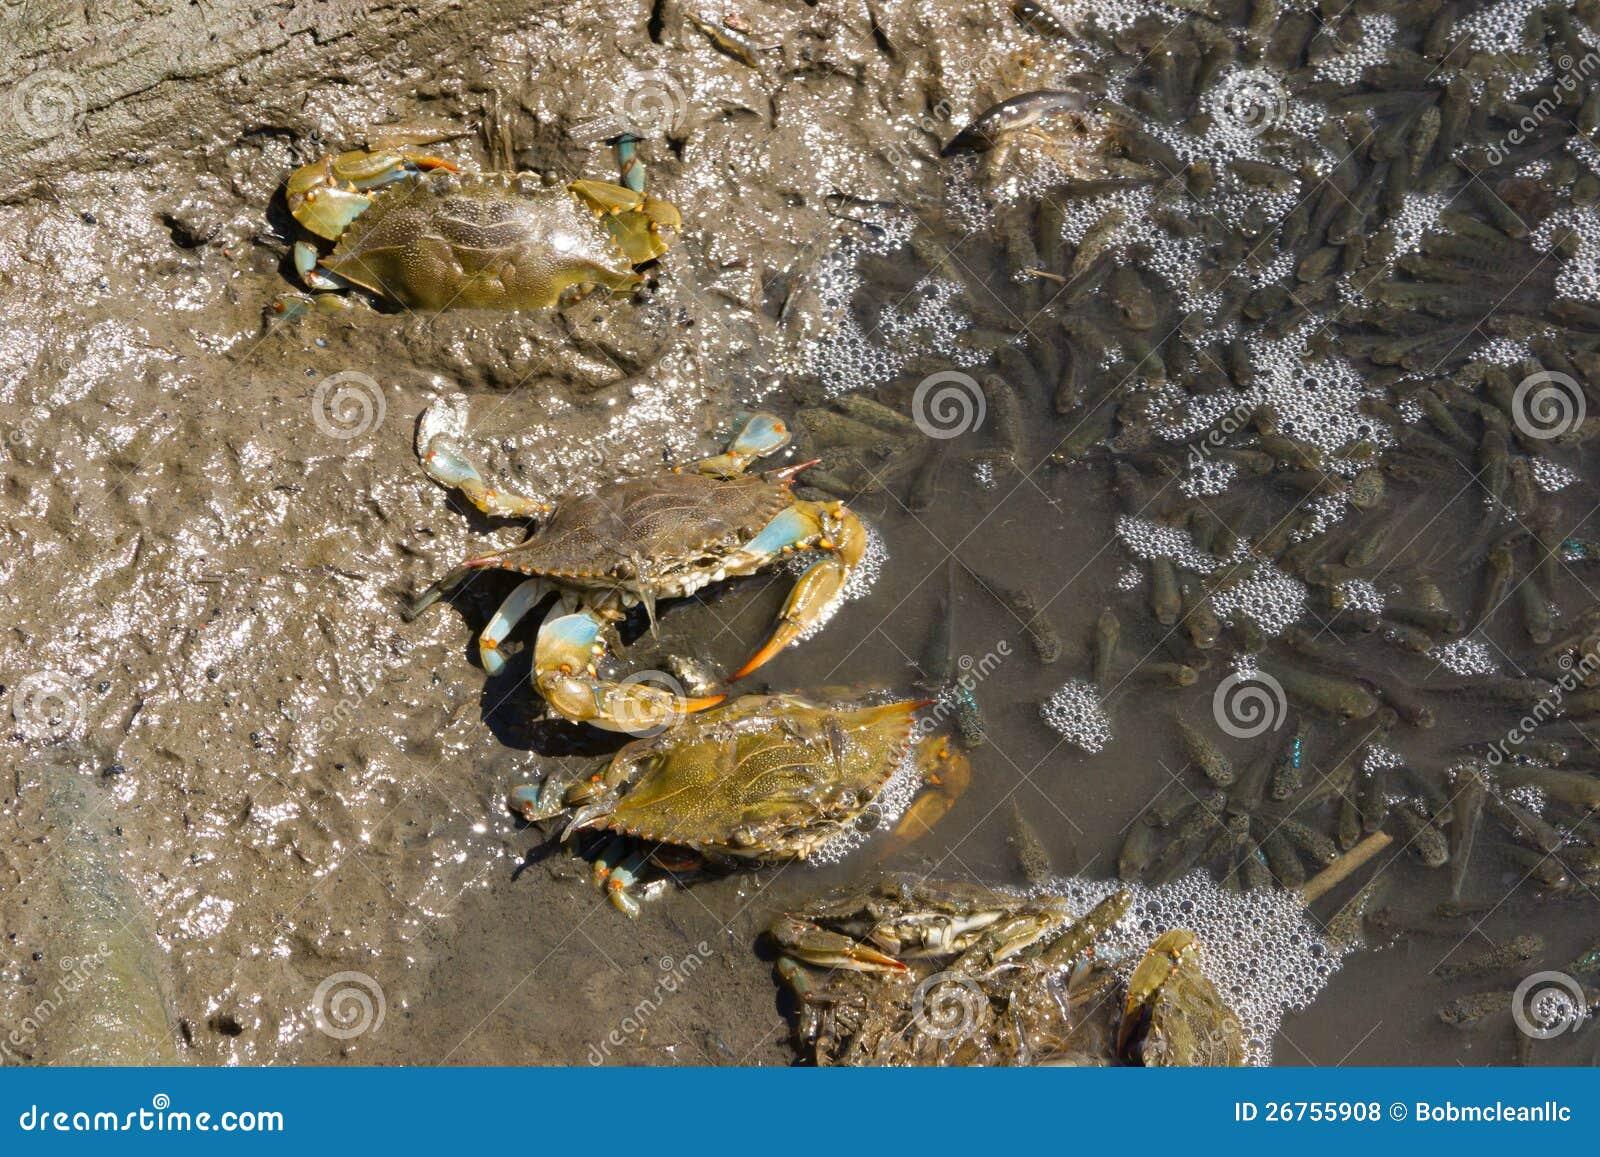 Atlantic blue crabs fishing royalty free stock photos for Blue crab fishing